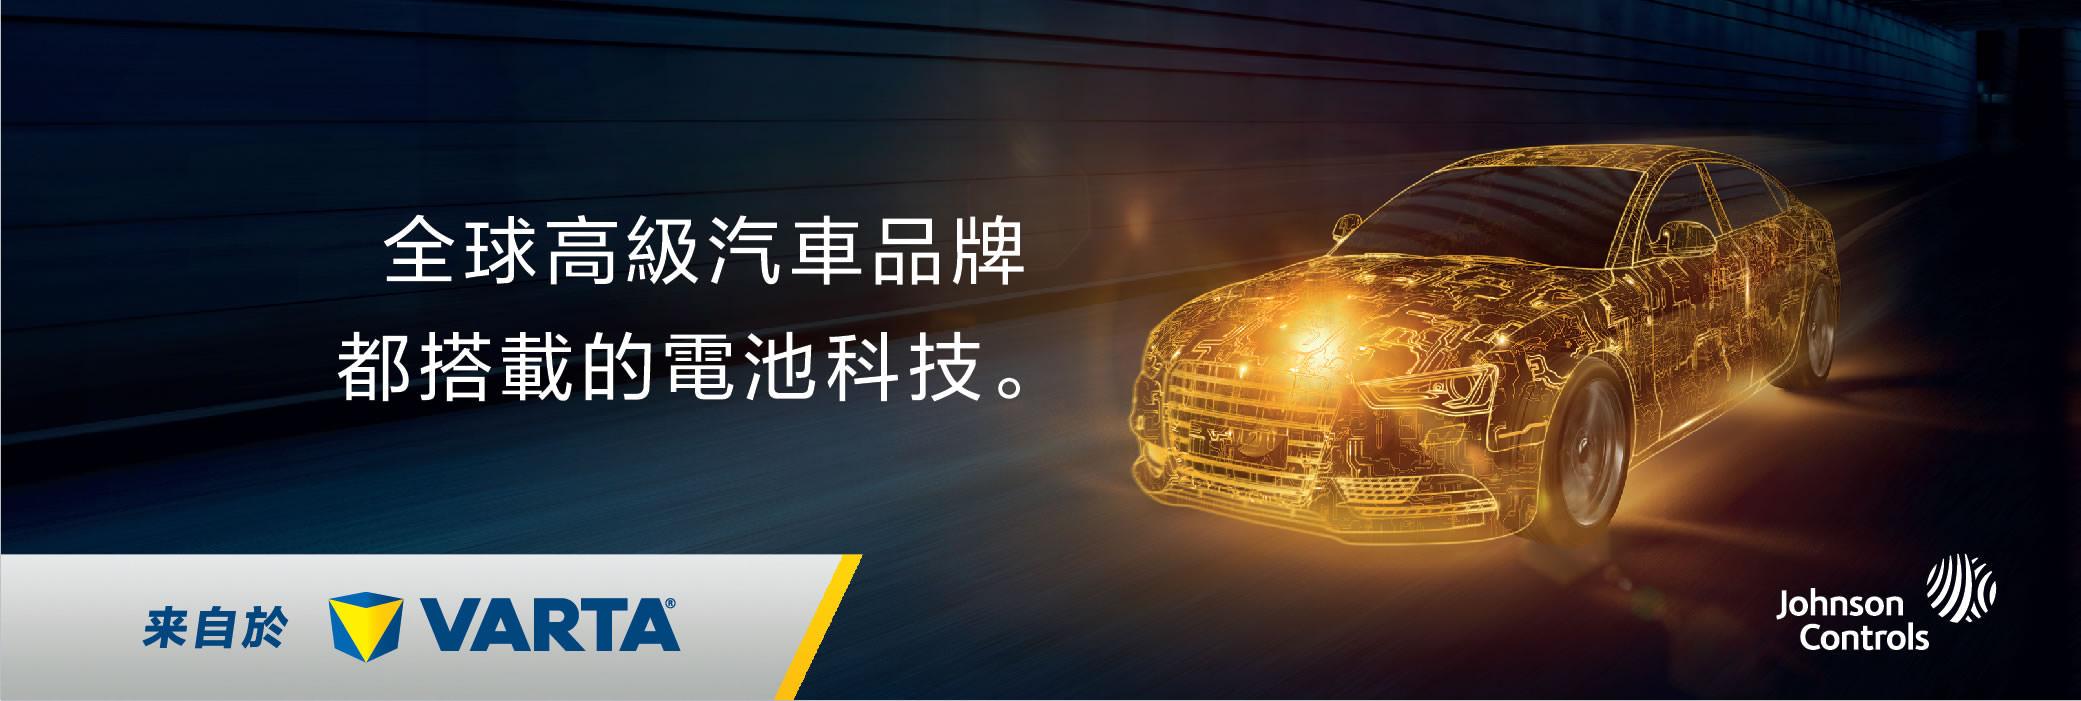 Zh Tw Varta Automotive Peugeot 308 Fuse Box Layout Web Banner Chi Fa Final Ol